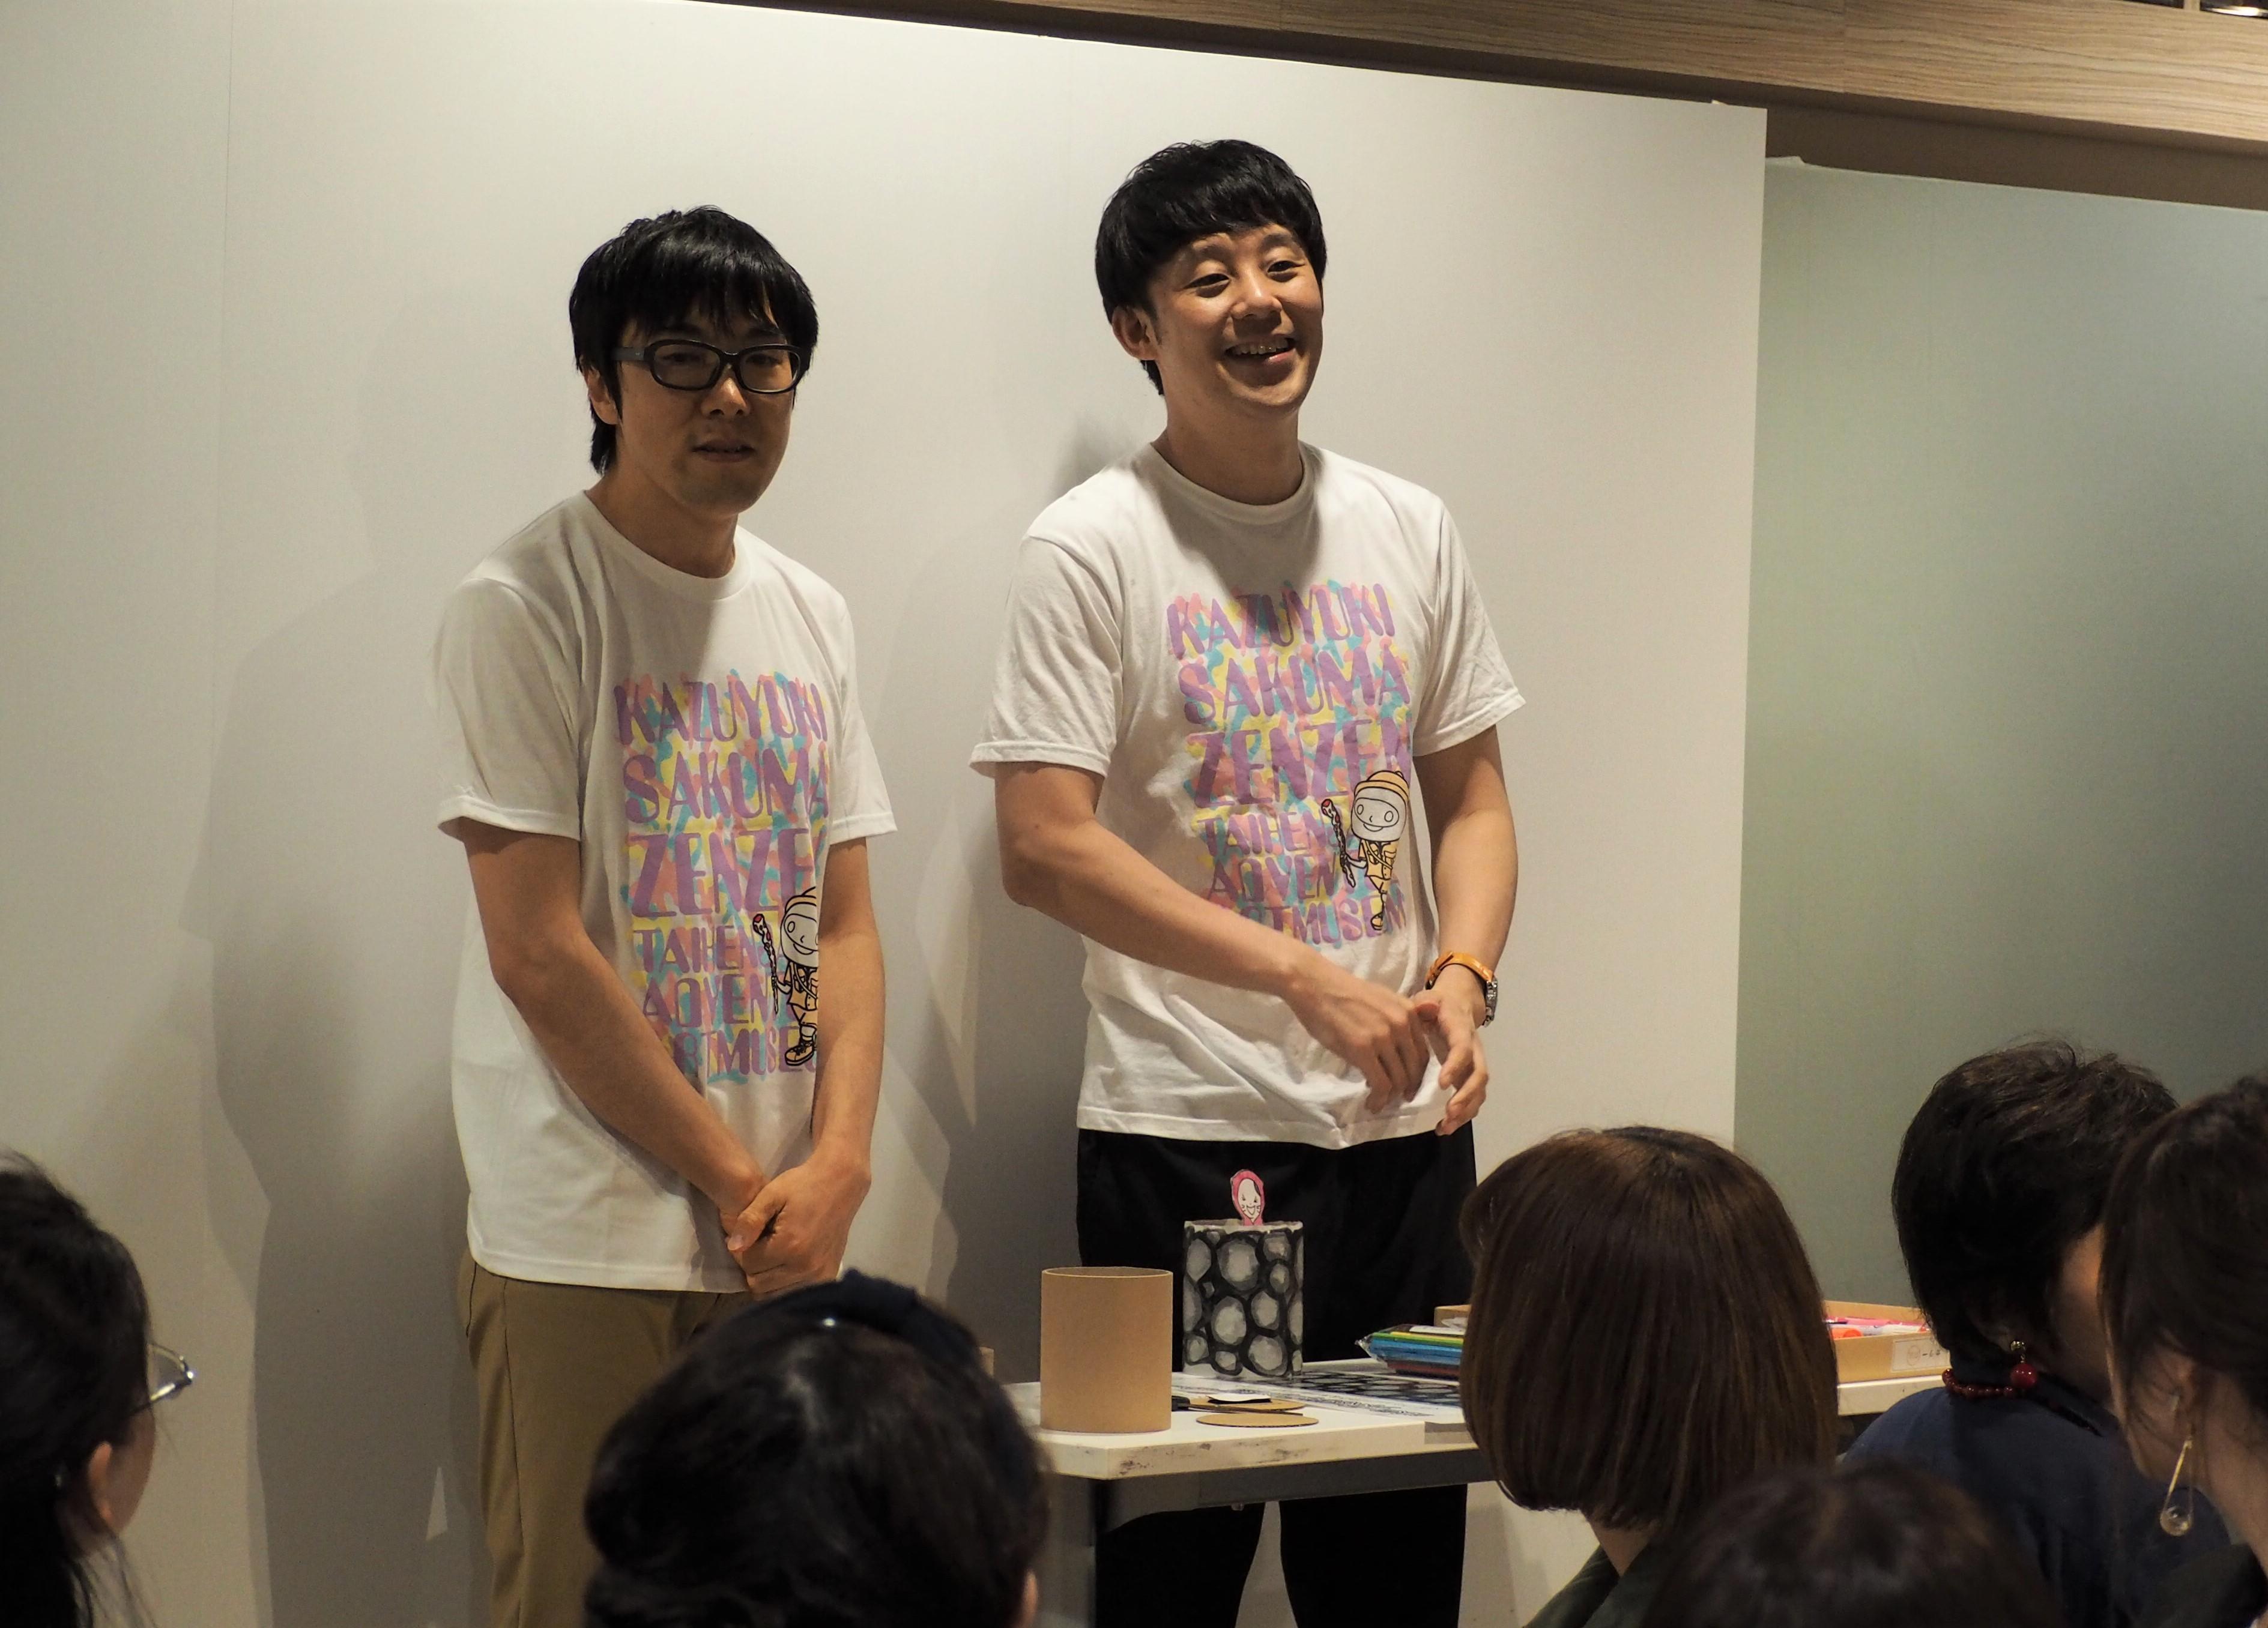 http://news.yoshimoto.co.jp/20180429215010-eec57a1ad5f3475c94cfbd9692da4b25812c9791.jpg